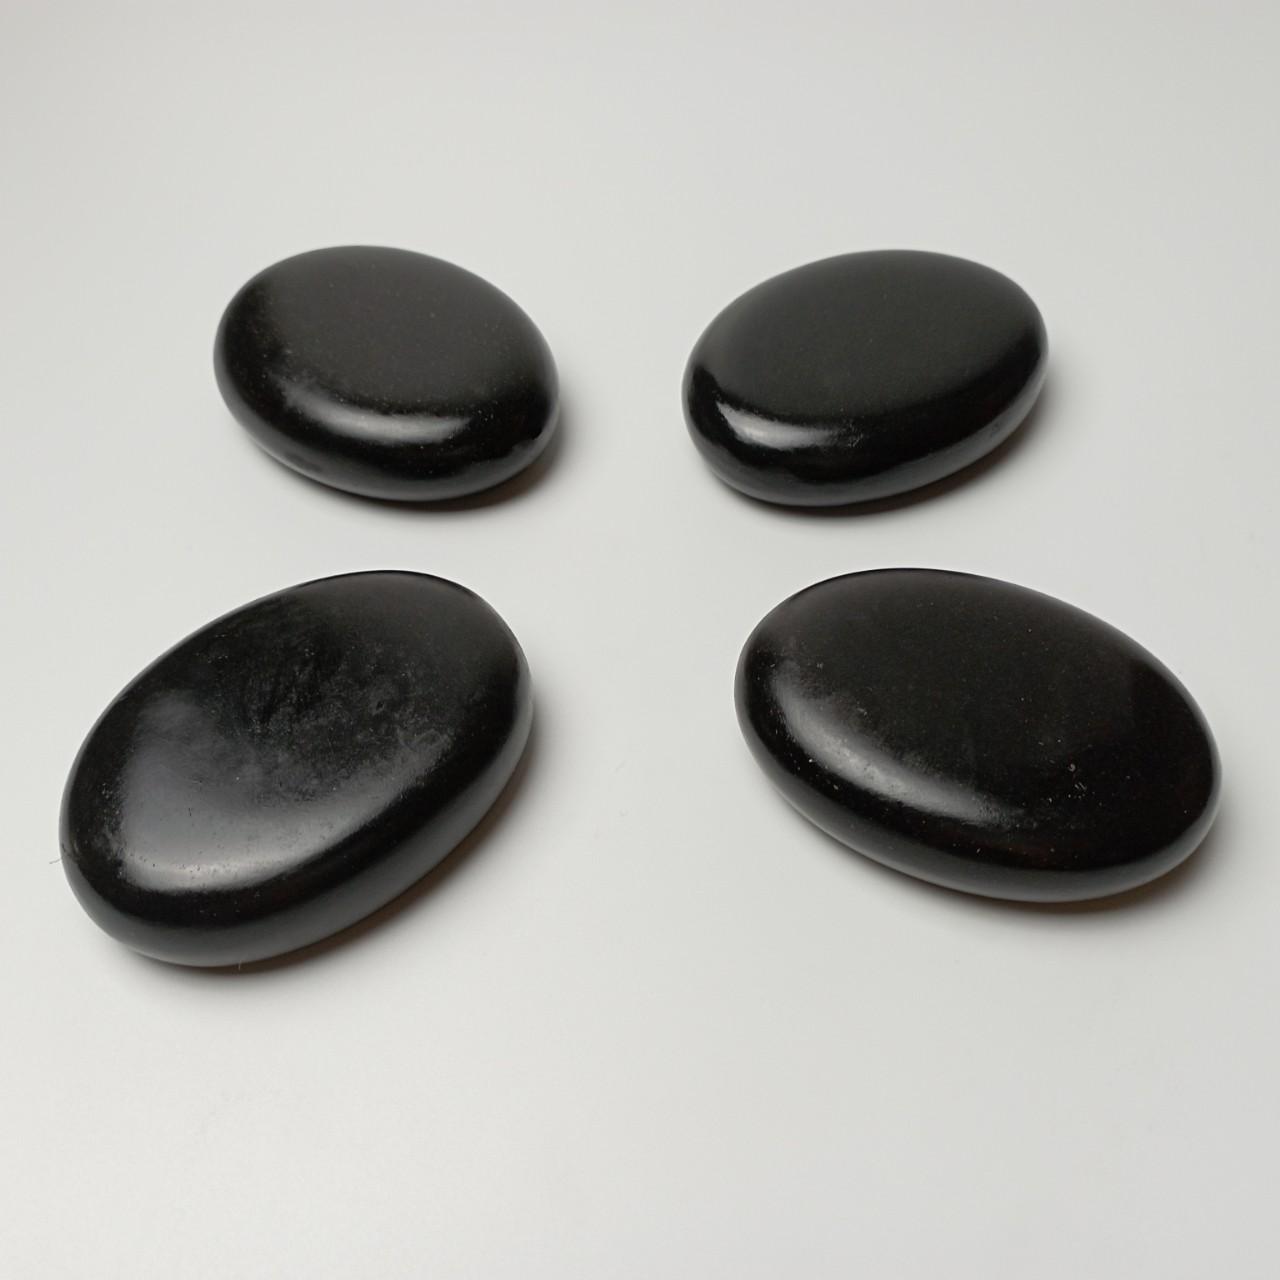 Đá nóng massage Ovan trung